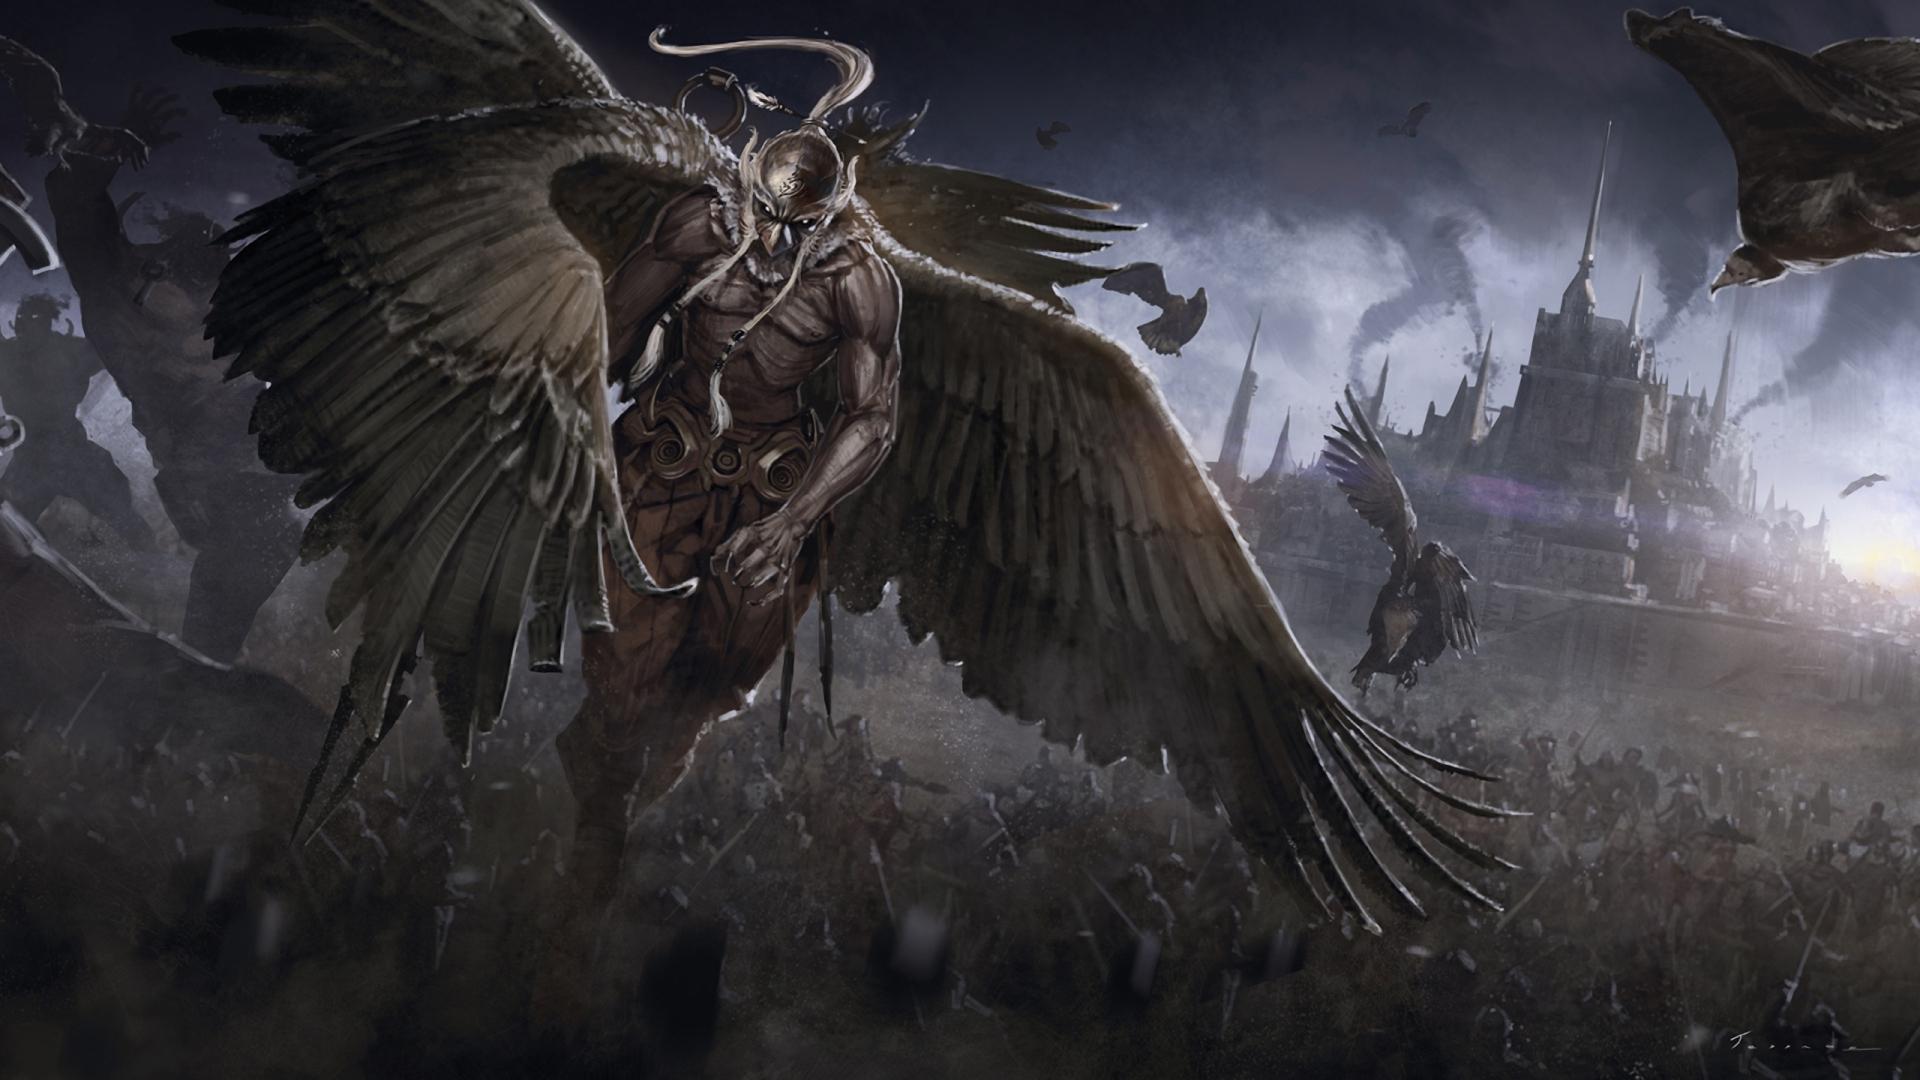 Warrior Battle Army Creatures War Cities Castle Dark Wallpaper 1920x1080 45314 Wallpaperup